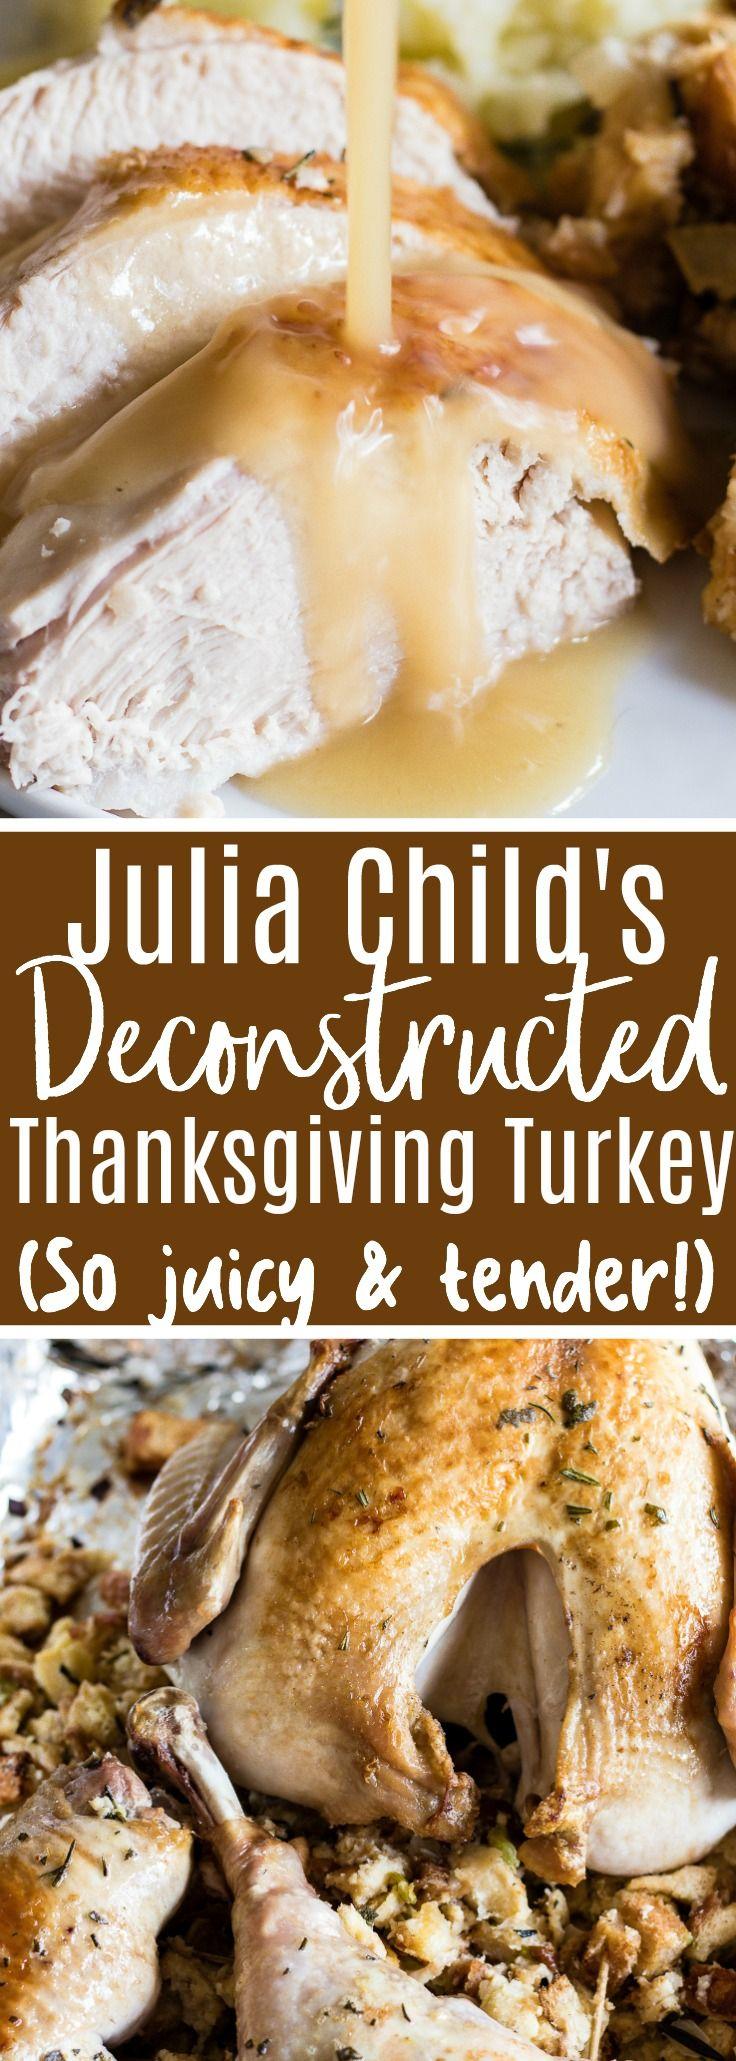 Photo of Julia Child's Deconstructed Thanksgiving Turkey